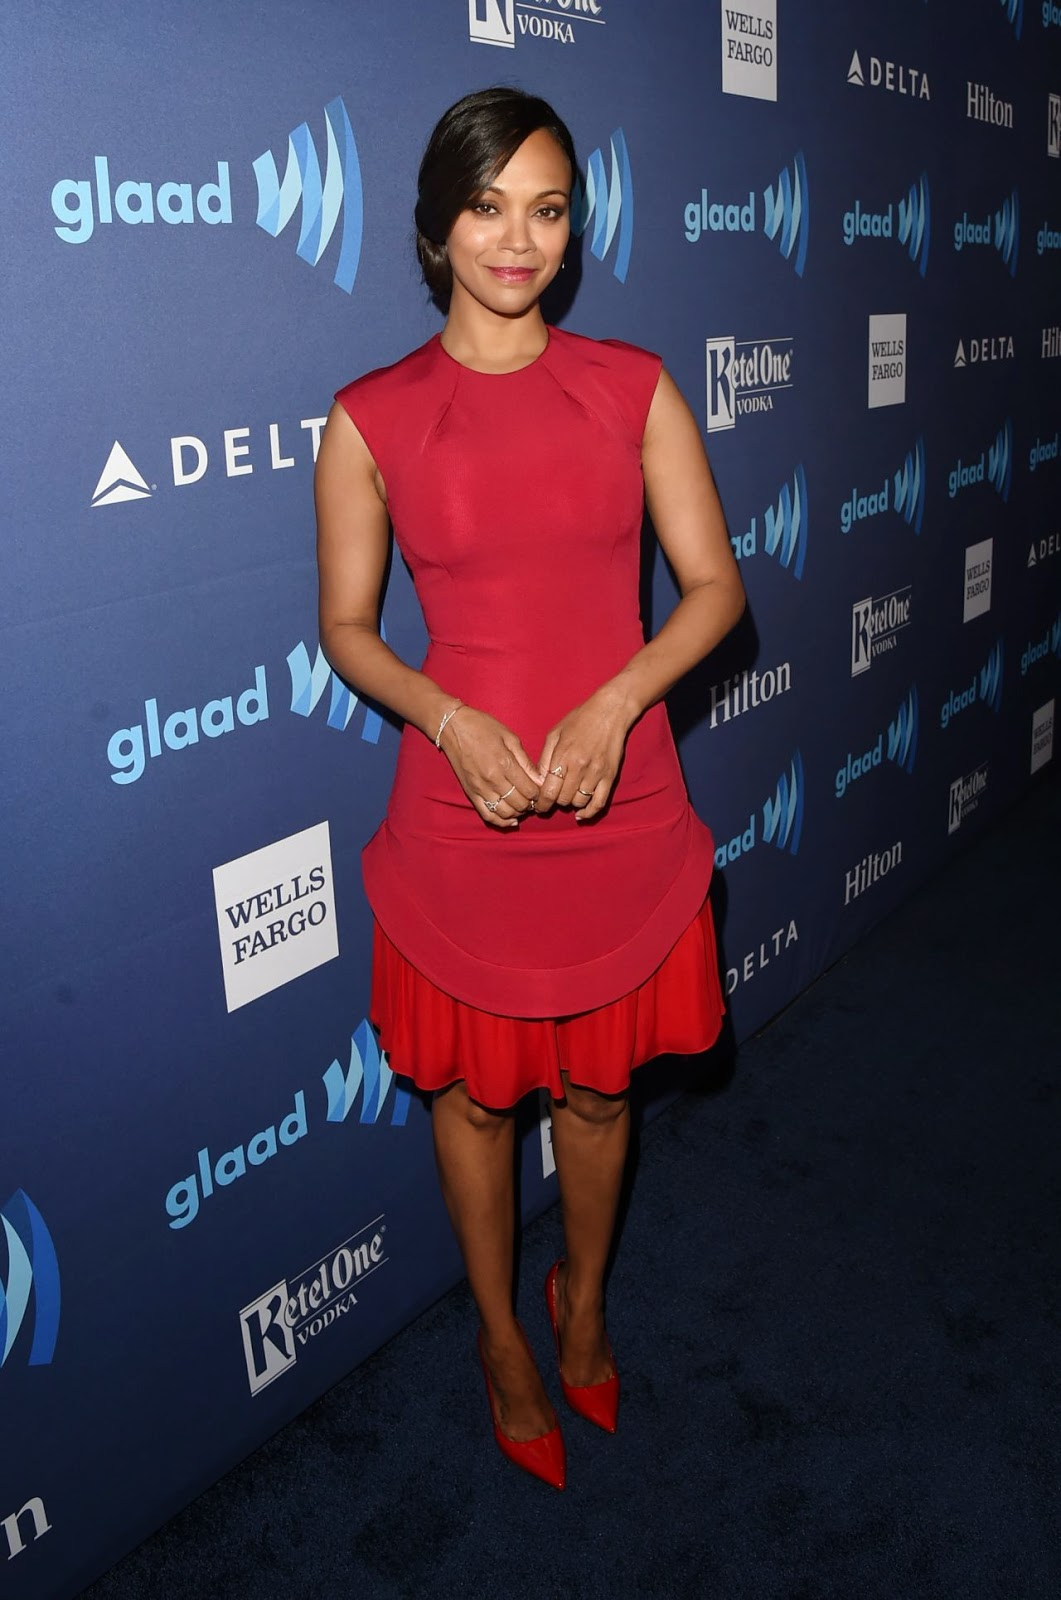 Zoe Saldana at the 2015 GLAAD Media Awards in Beverly Hills